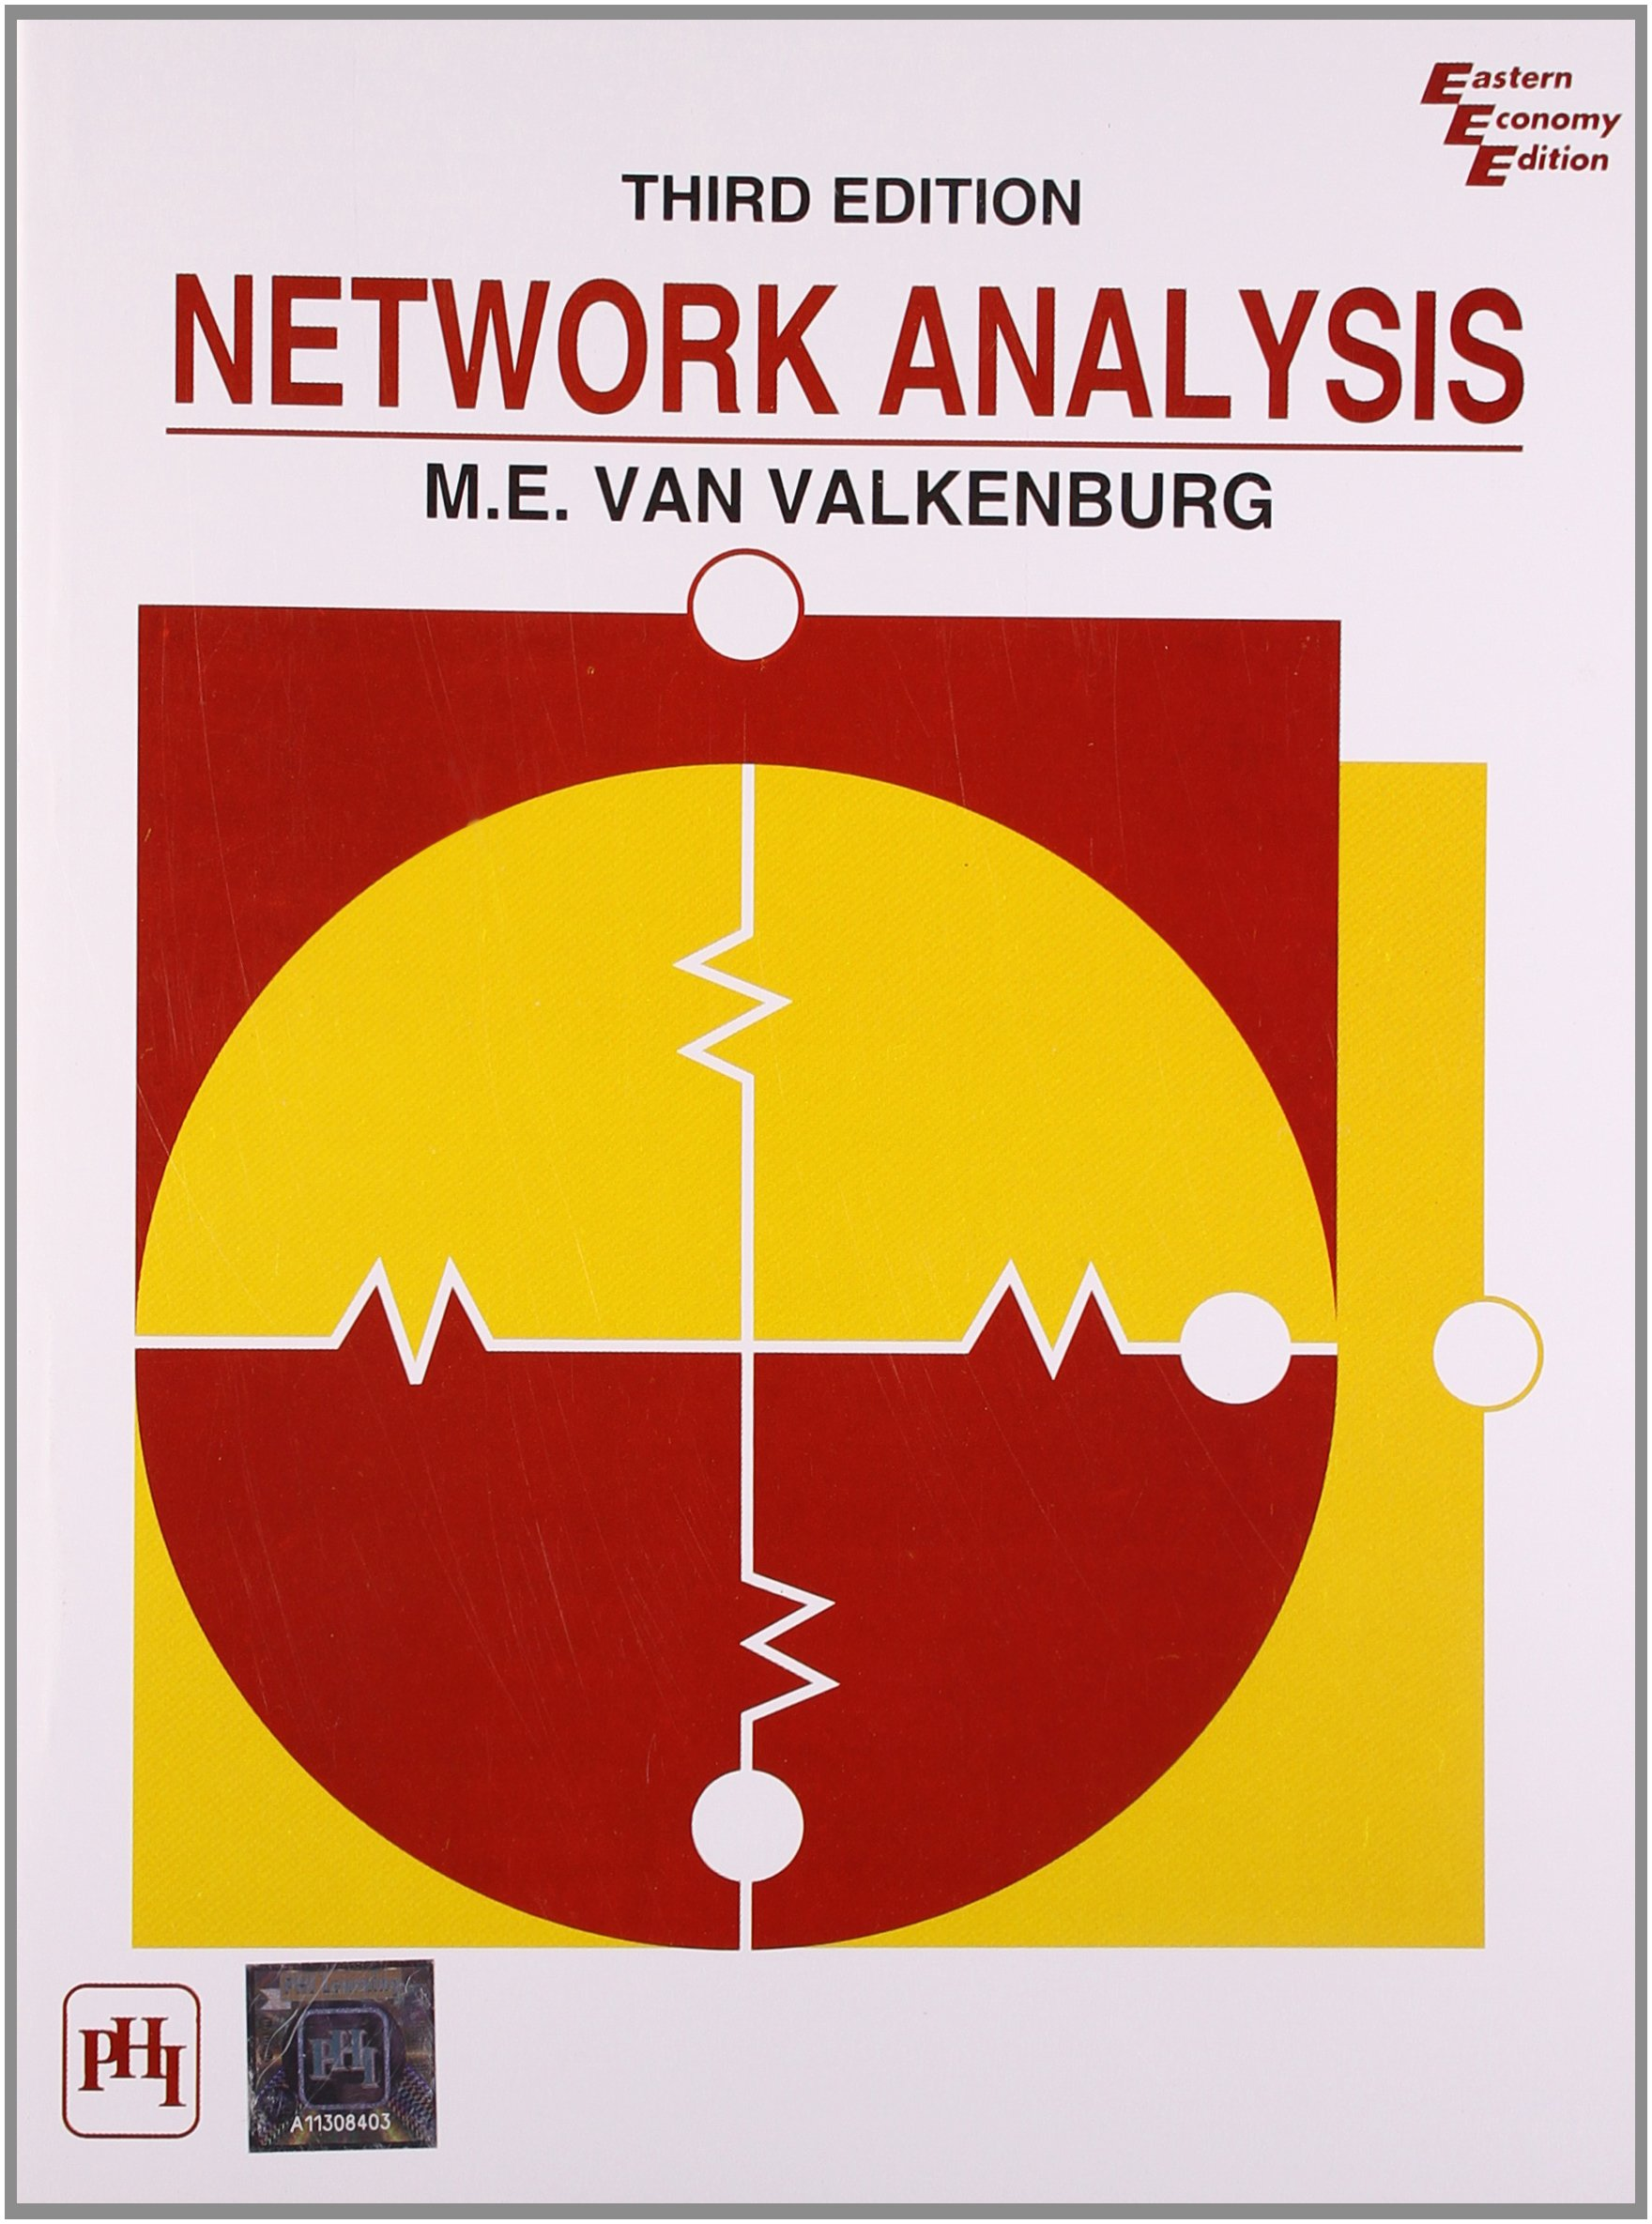 network analysis m e van valkenburg 9788120301566 amazon com books rh amazon com Van Valkenburg Family Actress Actress Van Valkenburg